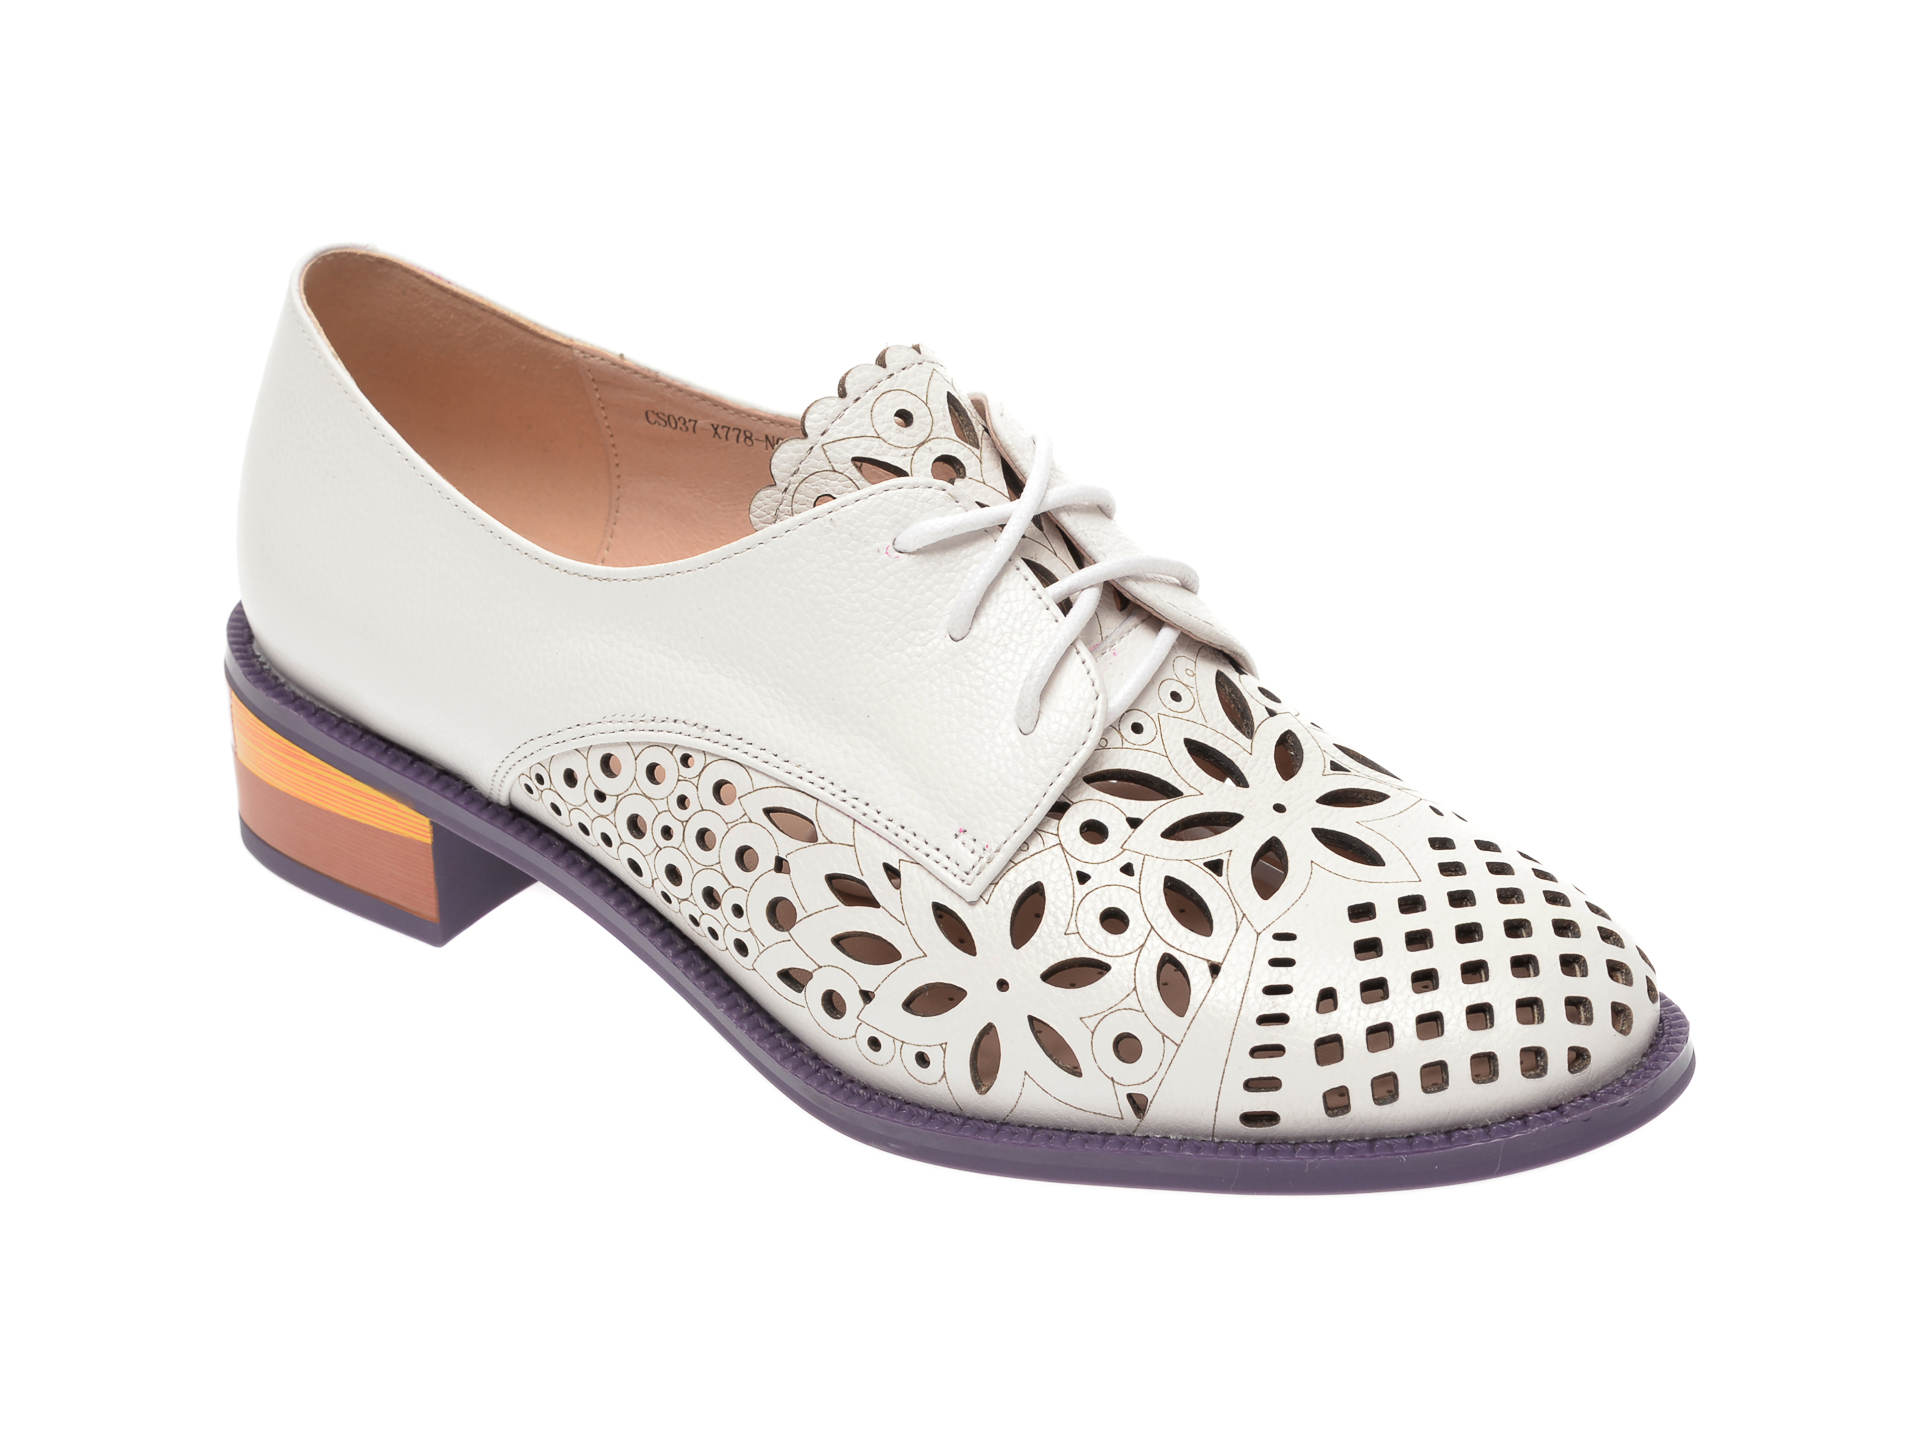 Pantofi IMAGE albi, CS037X7, din piele naturala imagine